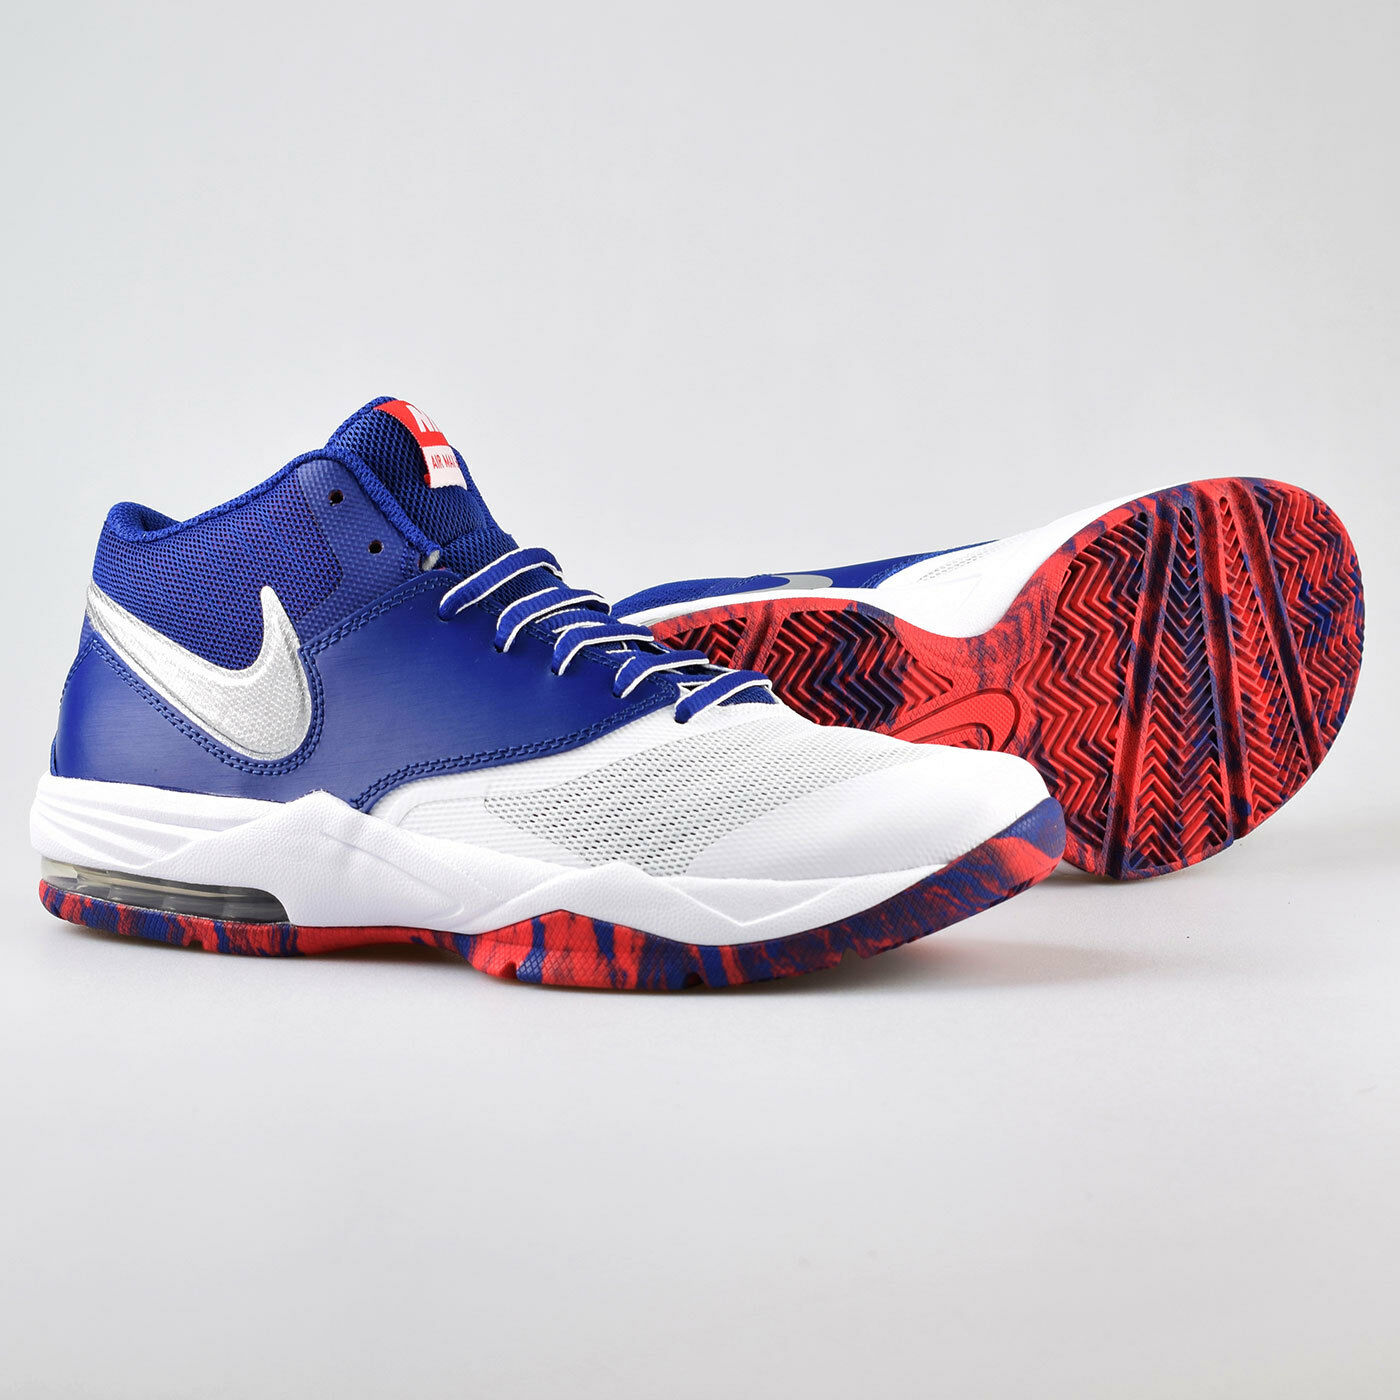 Nike Air Max Emergent Basket Bleu 818954-104 NEUF T. 42,5